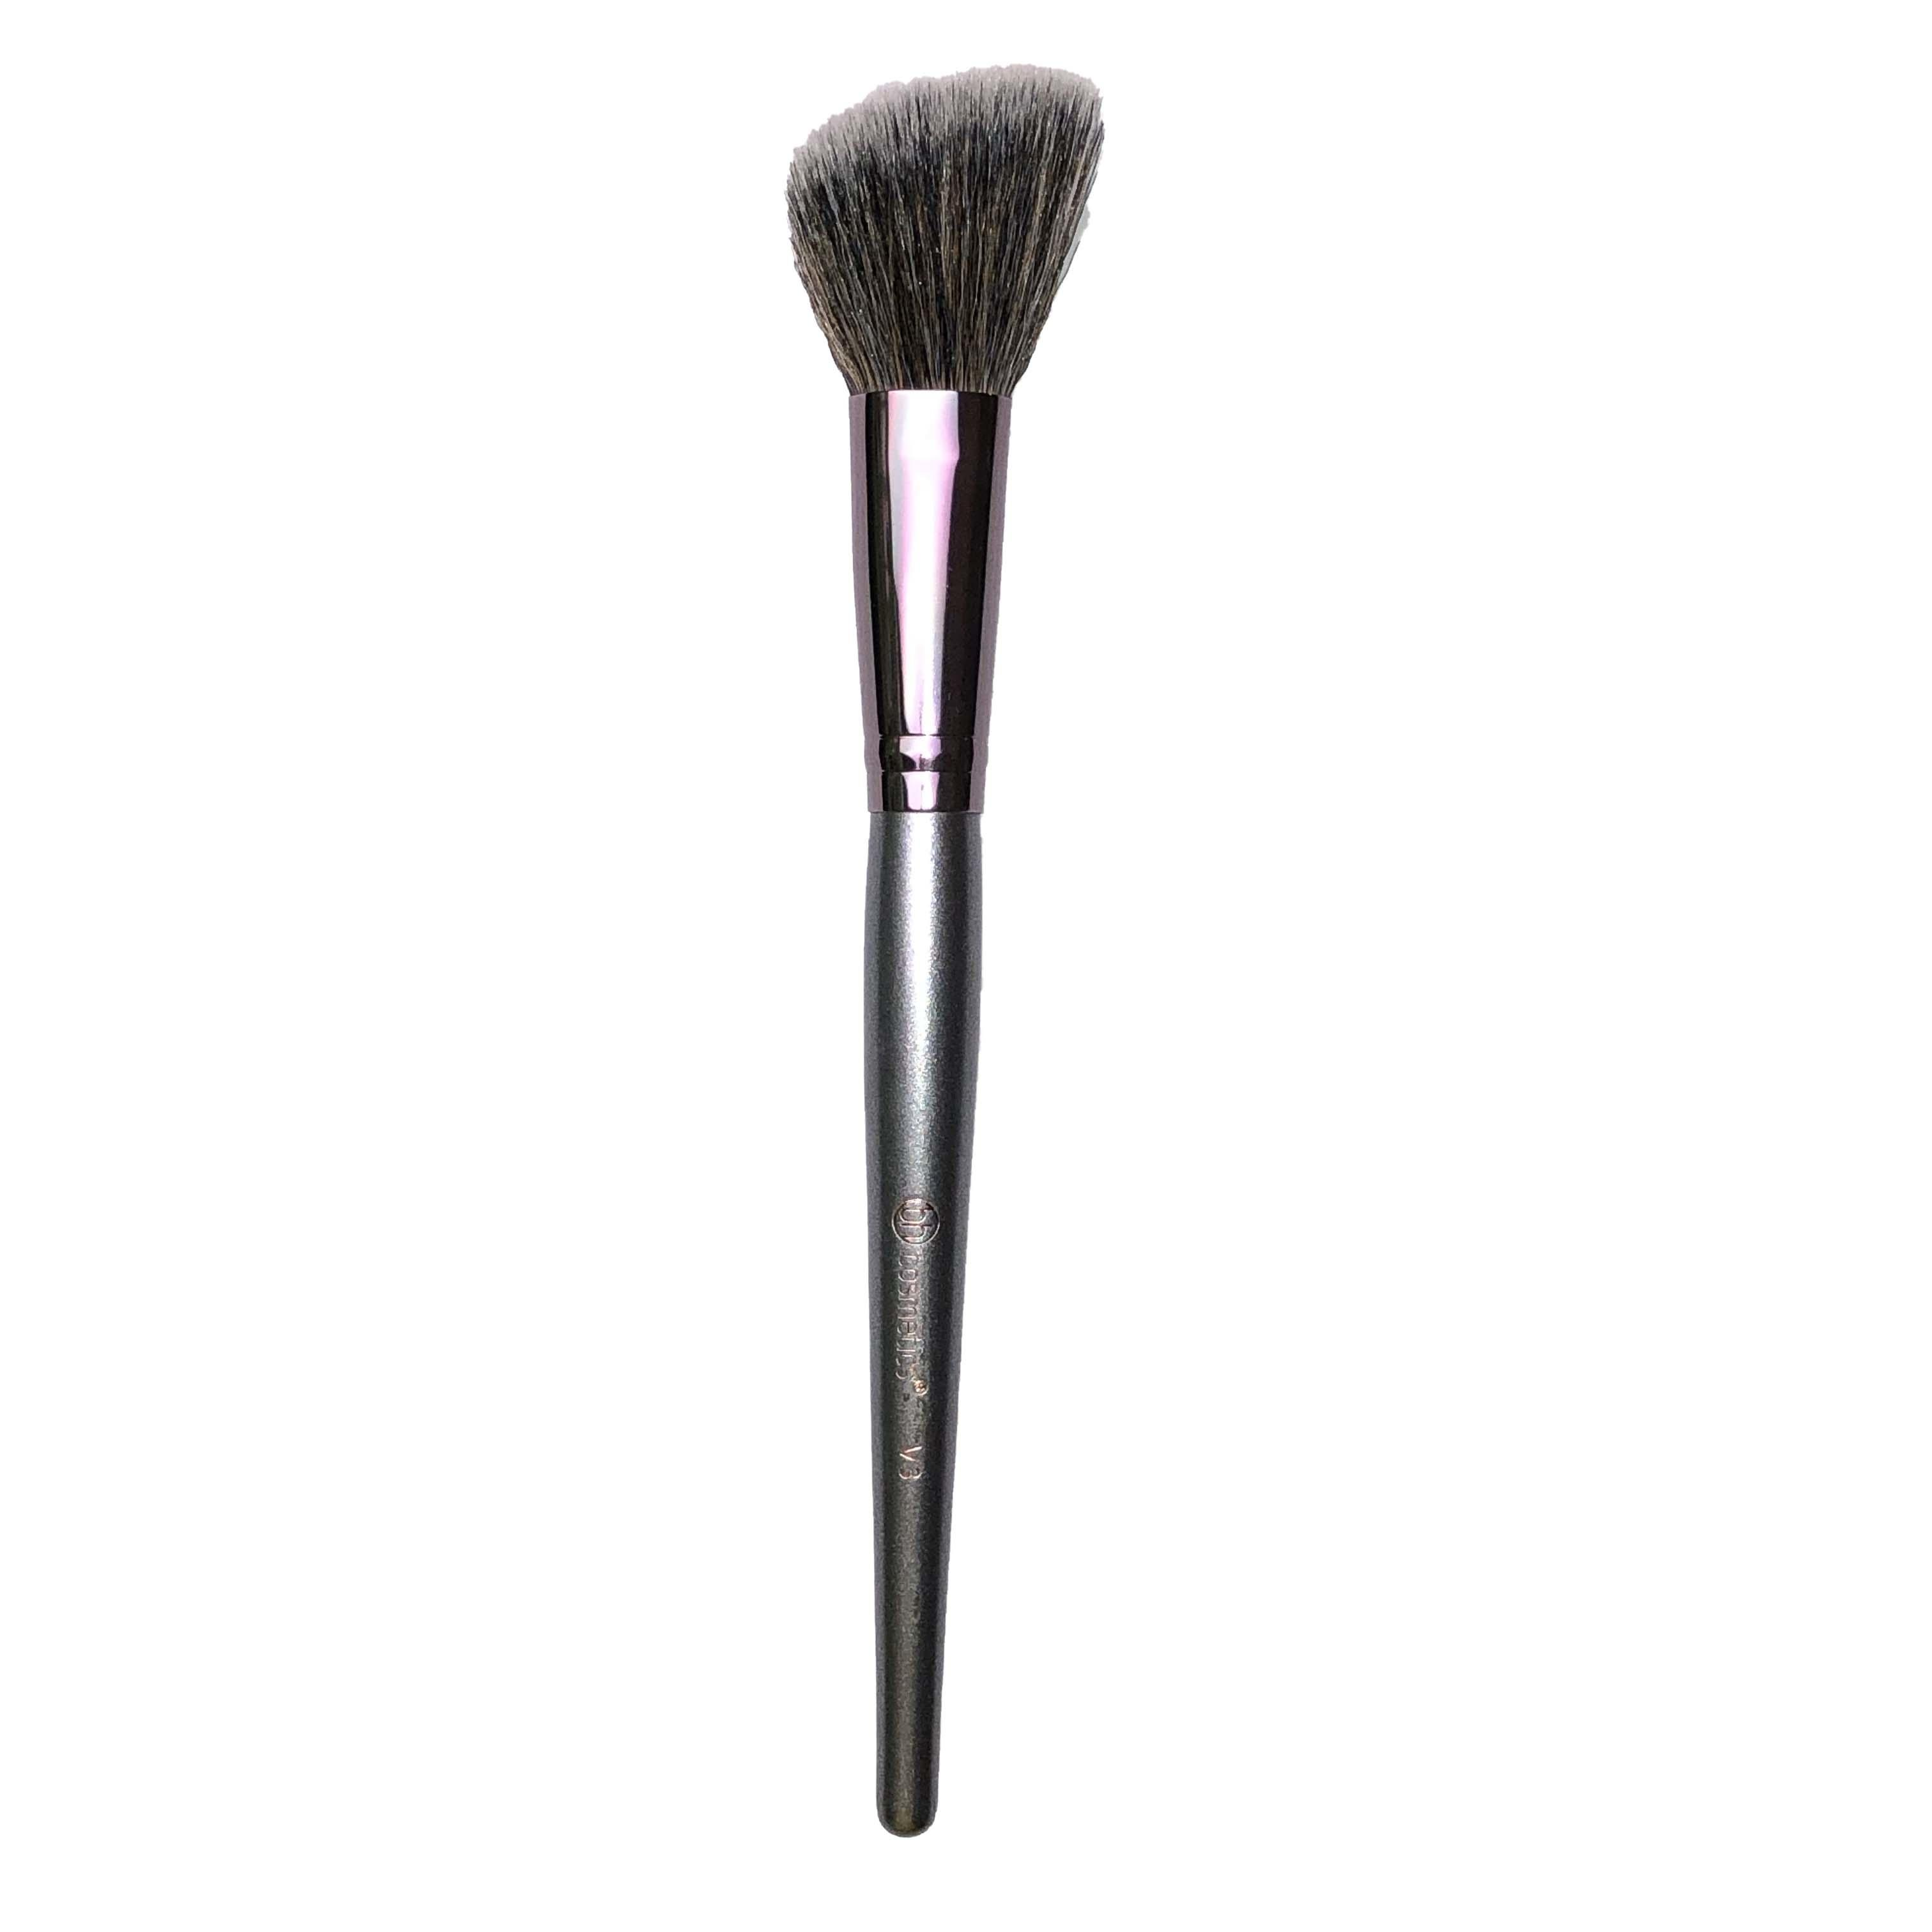 BH Cosmetics Angled Cheek Defining Blush Brush Pewter